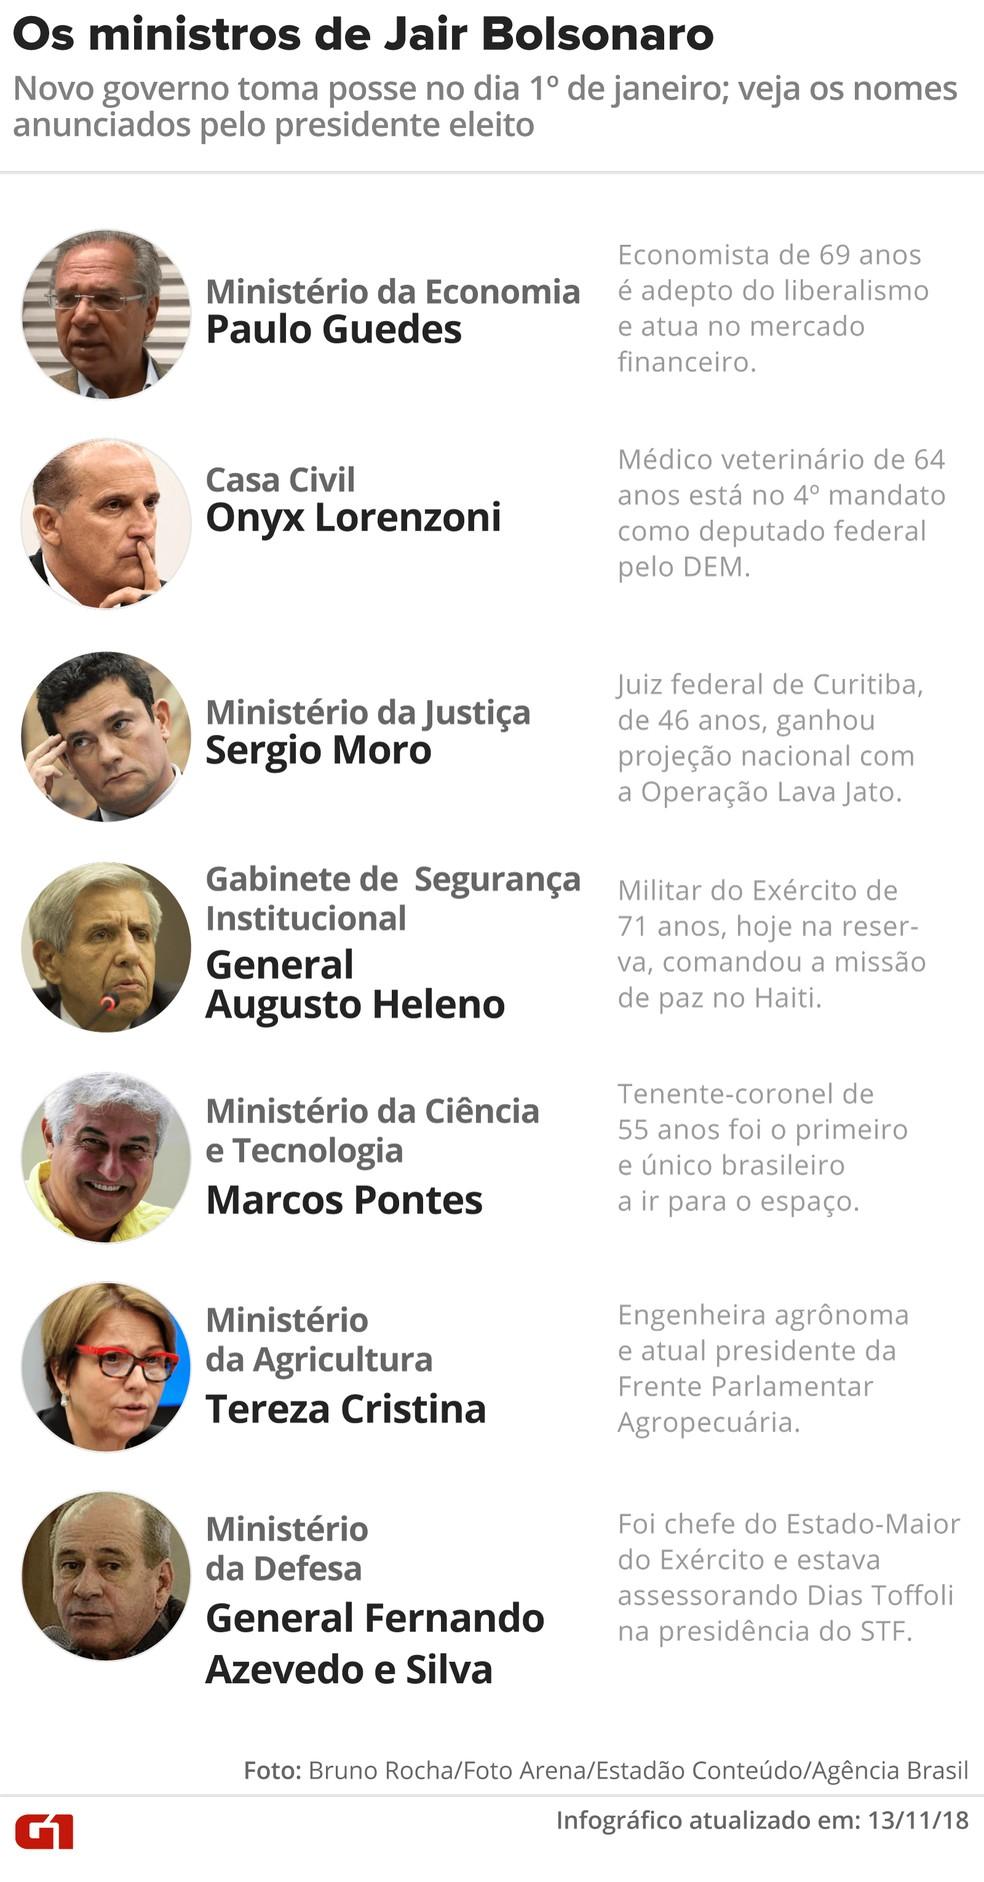 Ministros de Jair Bolsonaro — Foto: Juliane Monteiro e Karina Almeida/G1